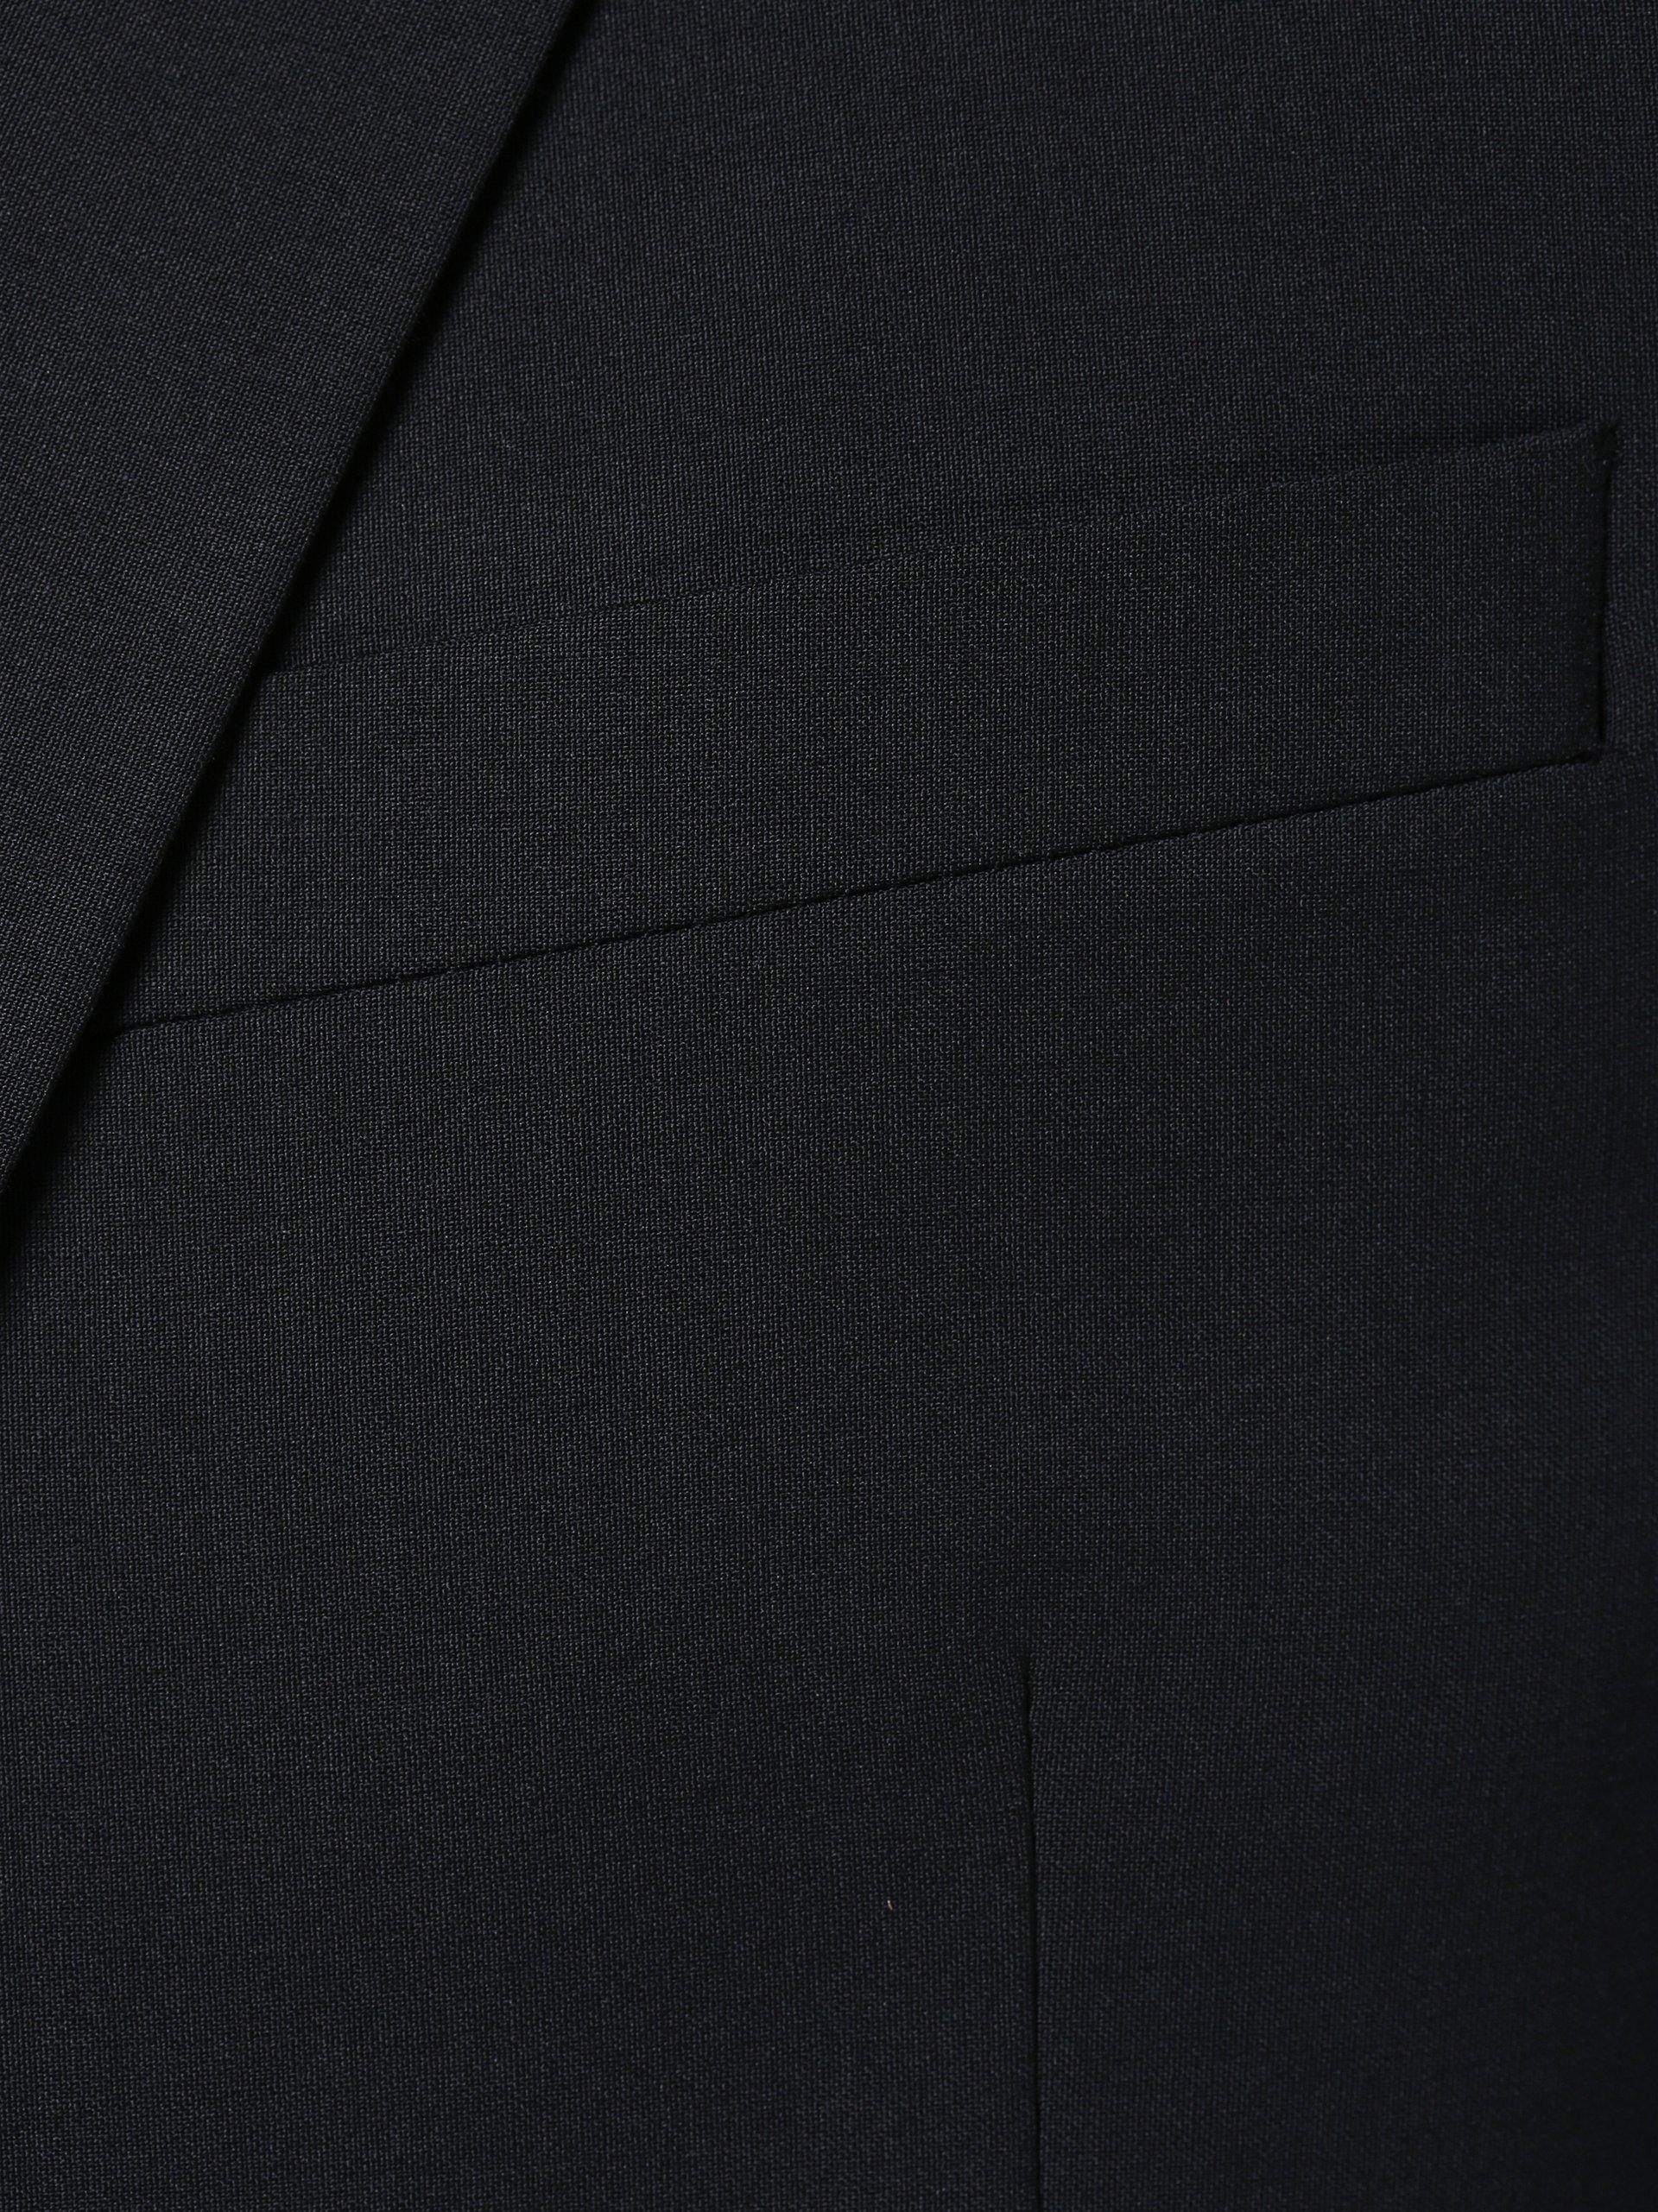 Finshley & Harding Herren Baukasten-Sakko - Black Label